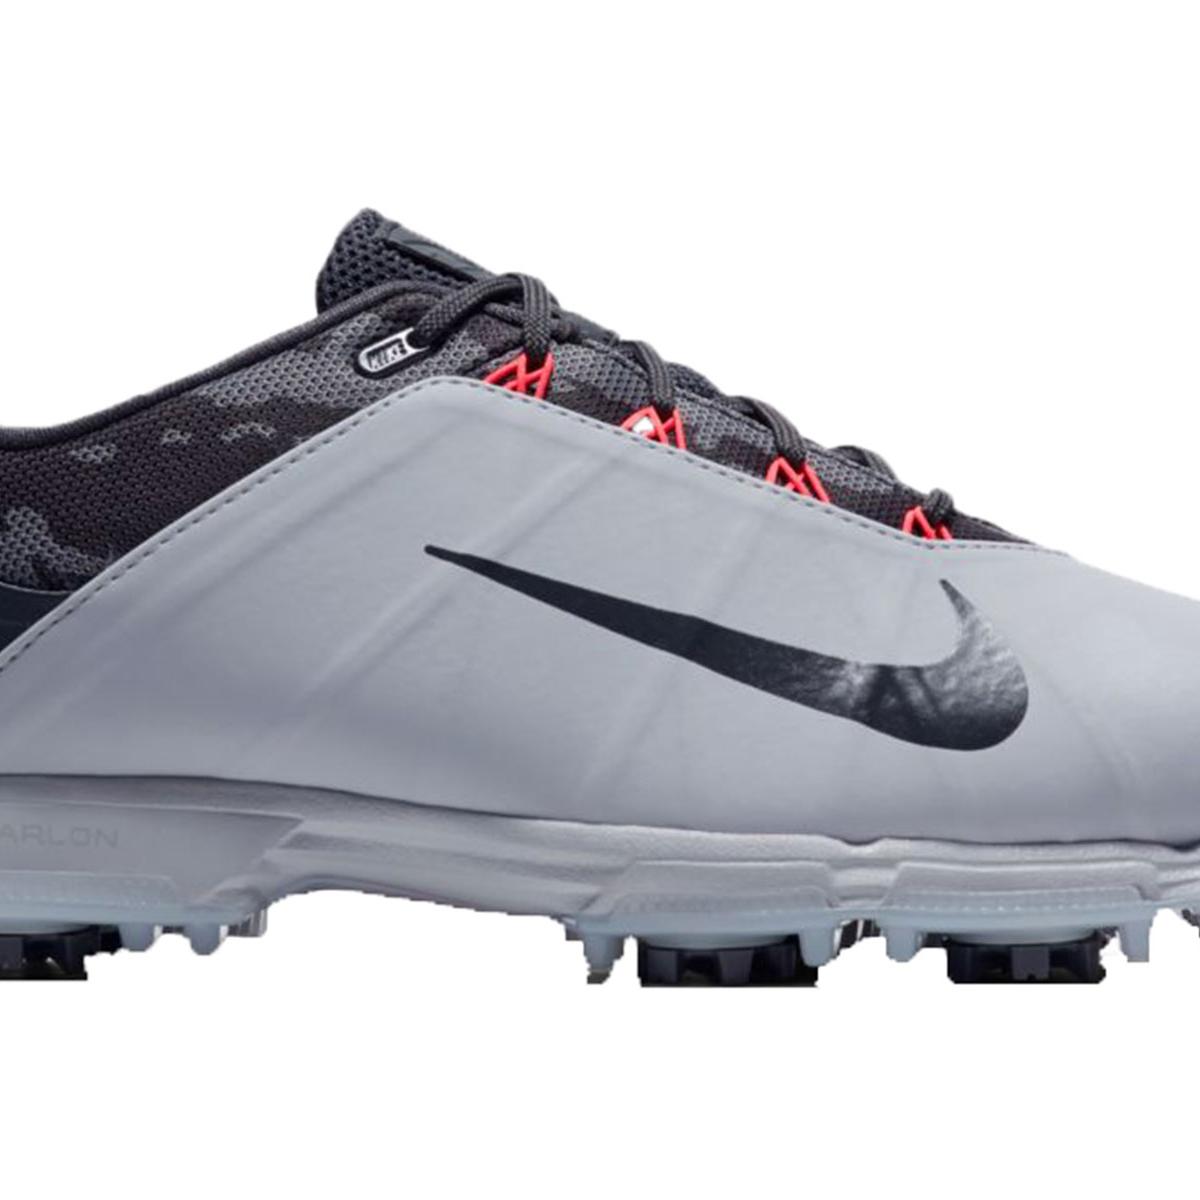 387ddc71cd48 Nike Golf Lunar Fire Shoes from american golf